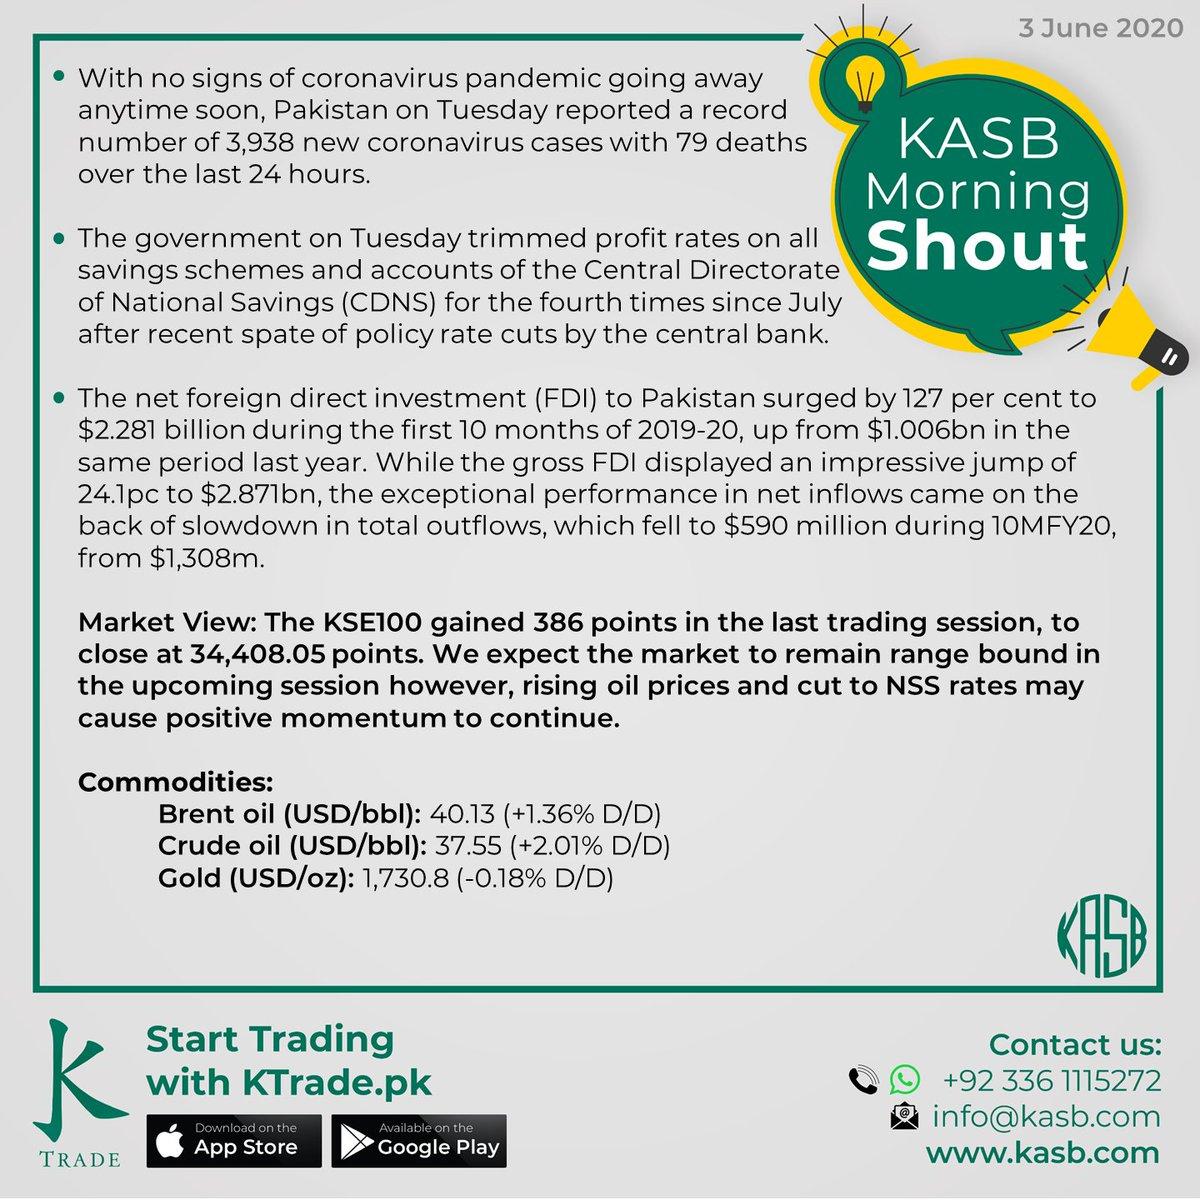 KASB Morning Shout: Our views on today's news #kasb #smartinvesting #psx #stockmarket #KTrade #onlinetrading #pakistaneconomy #imrankhan #sbp #inflation #kse100 #brokeragehouse #psxstocks #marketupdate #emergingmarkets #frontiermarkets #news #morning #today #views https://t.co/B6a66TsnPs